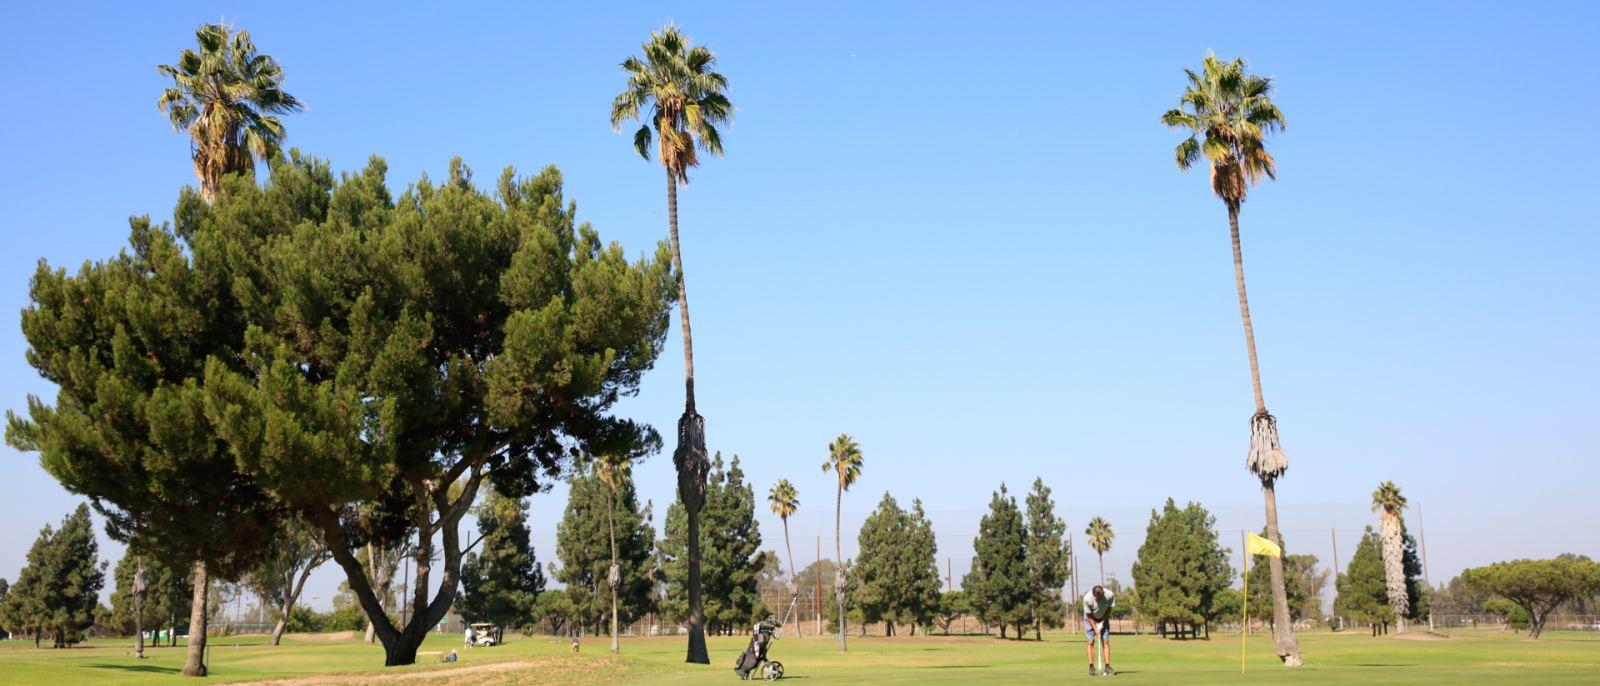 Alondra Golf Course golfer putting